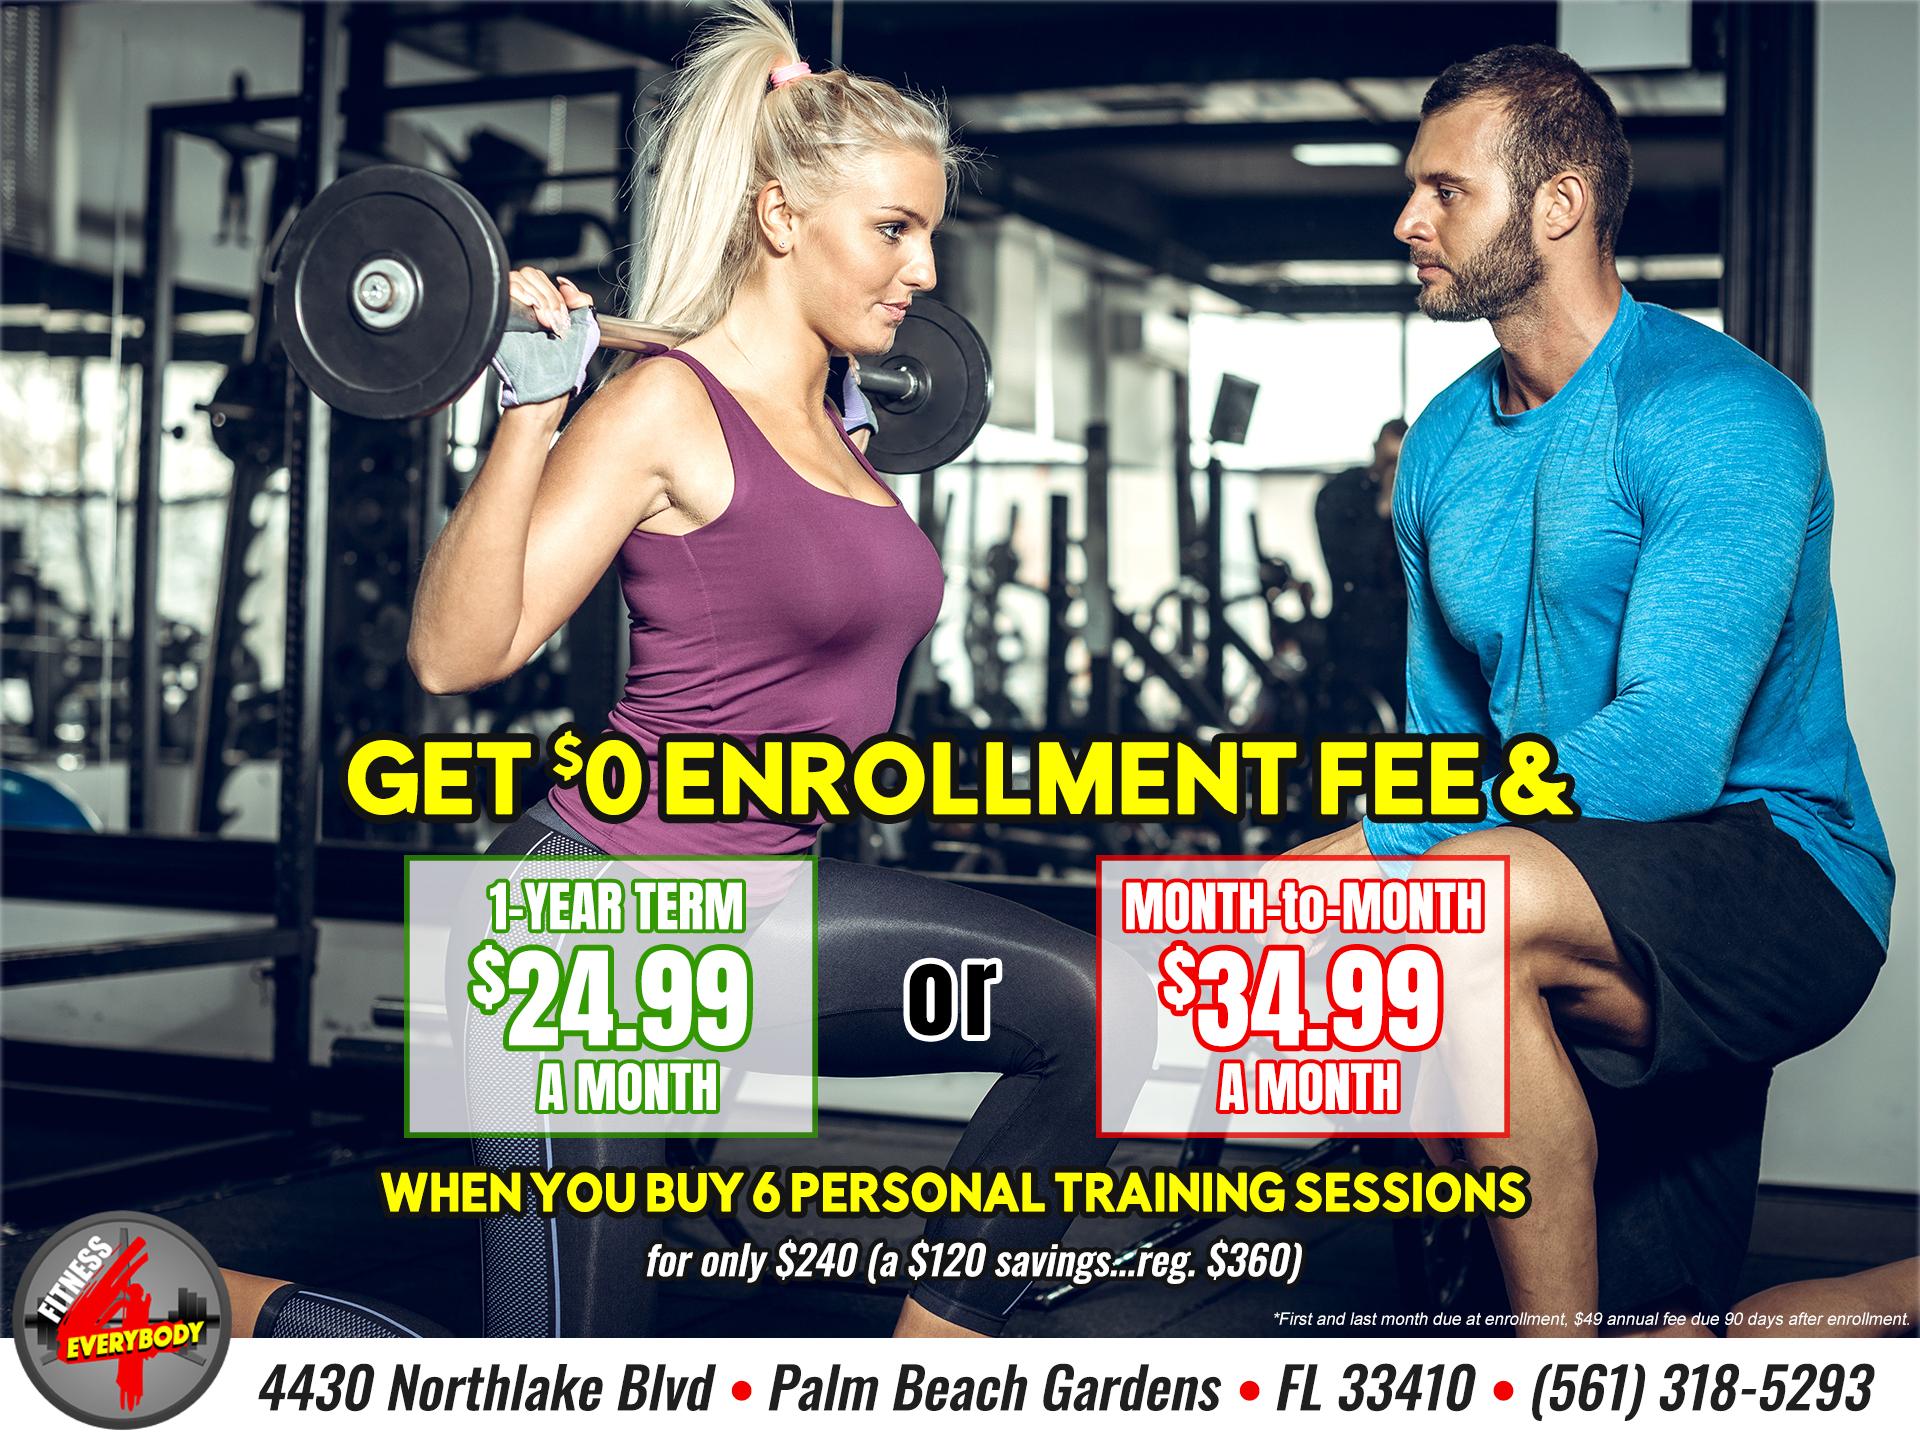 Membership & Personal Training Specials